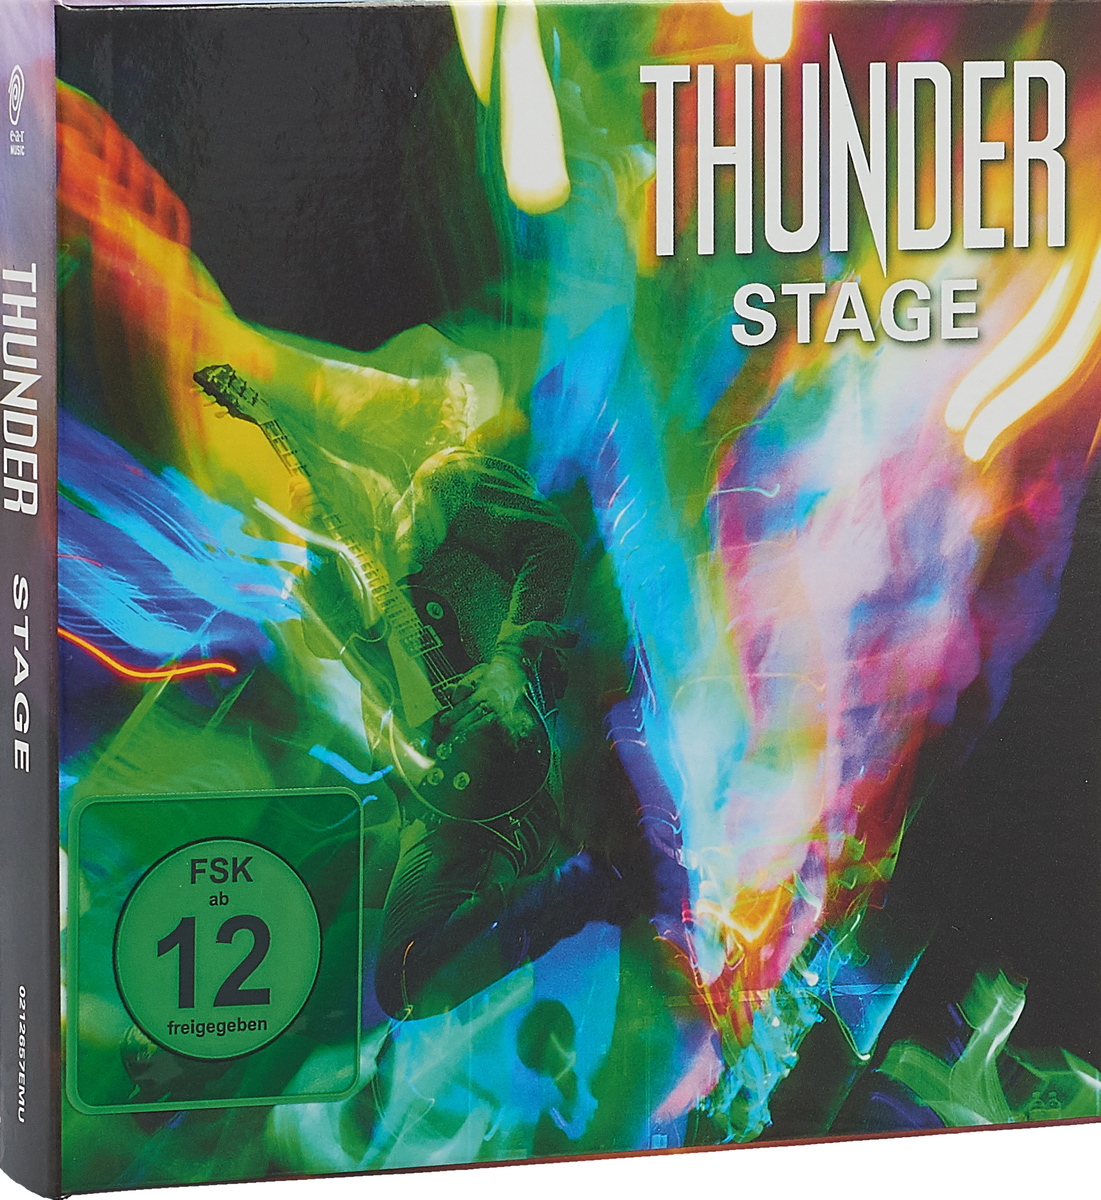 Фото - Thunder: Stage. Limited Super Video (Blu-ray + DVD) dvd blu ray